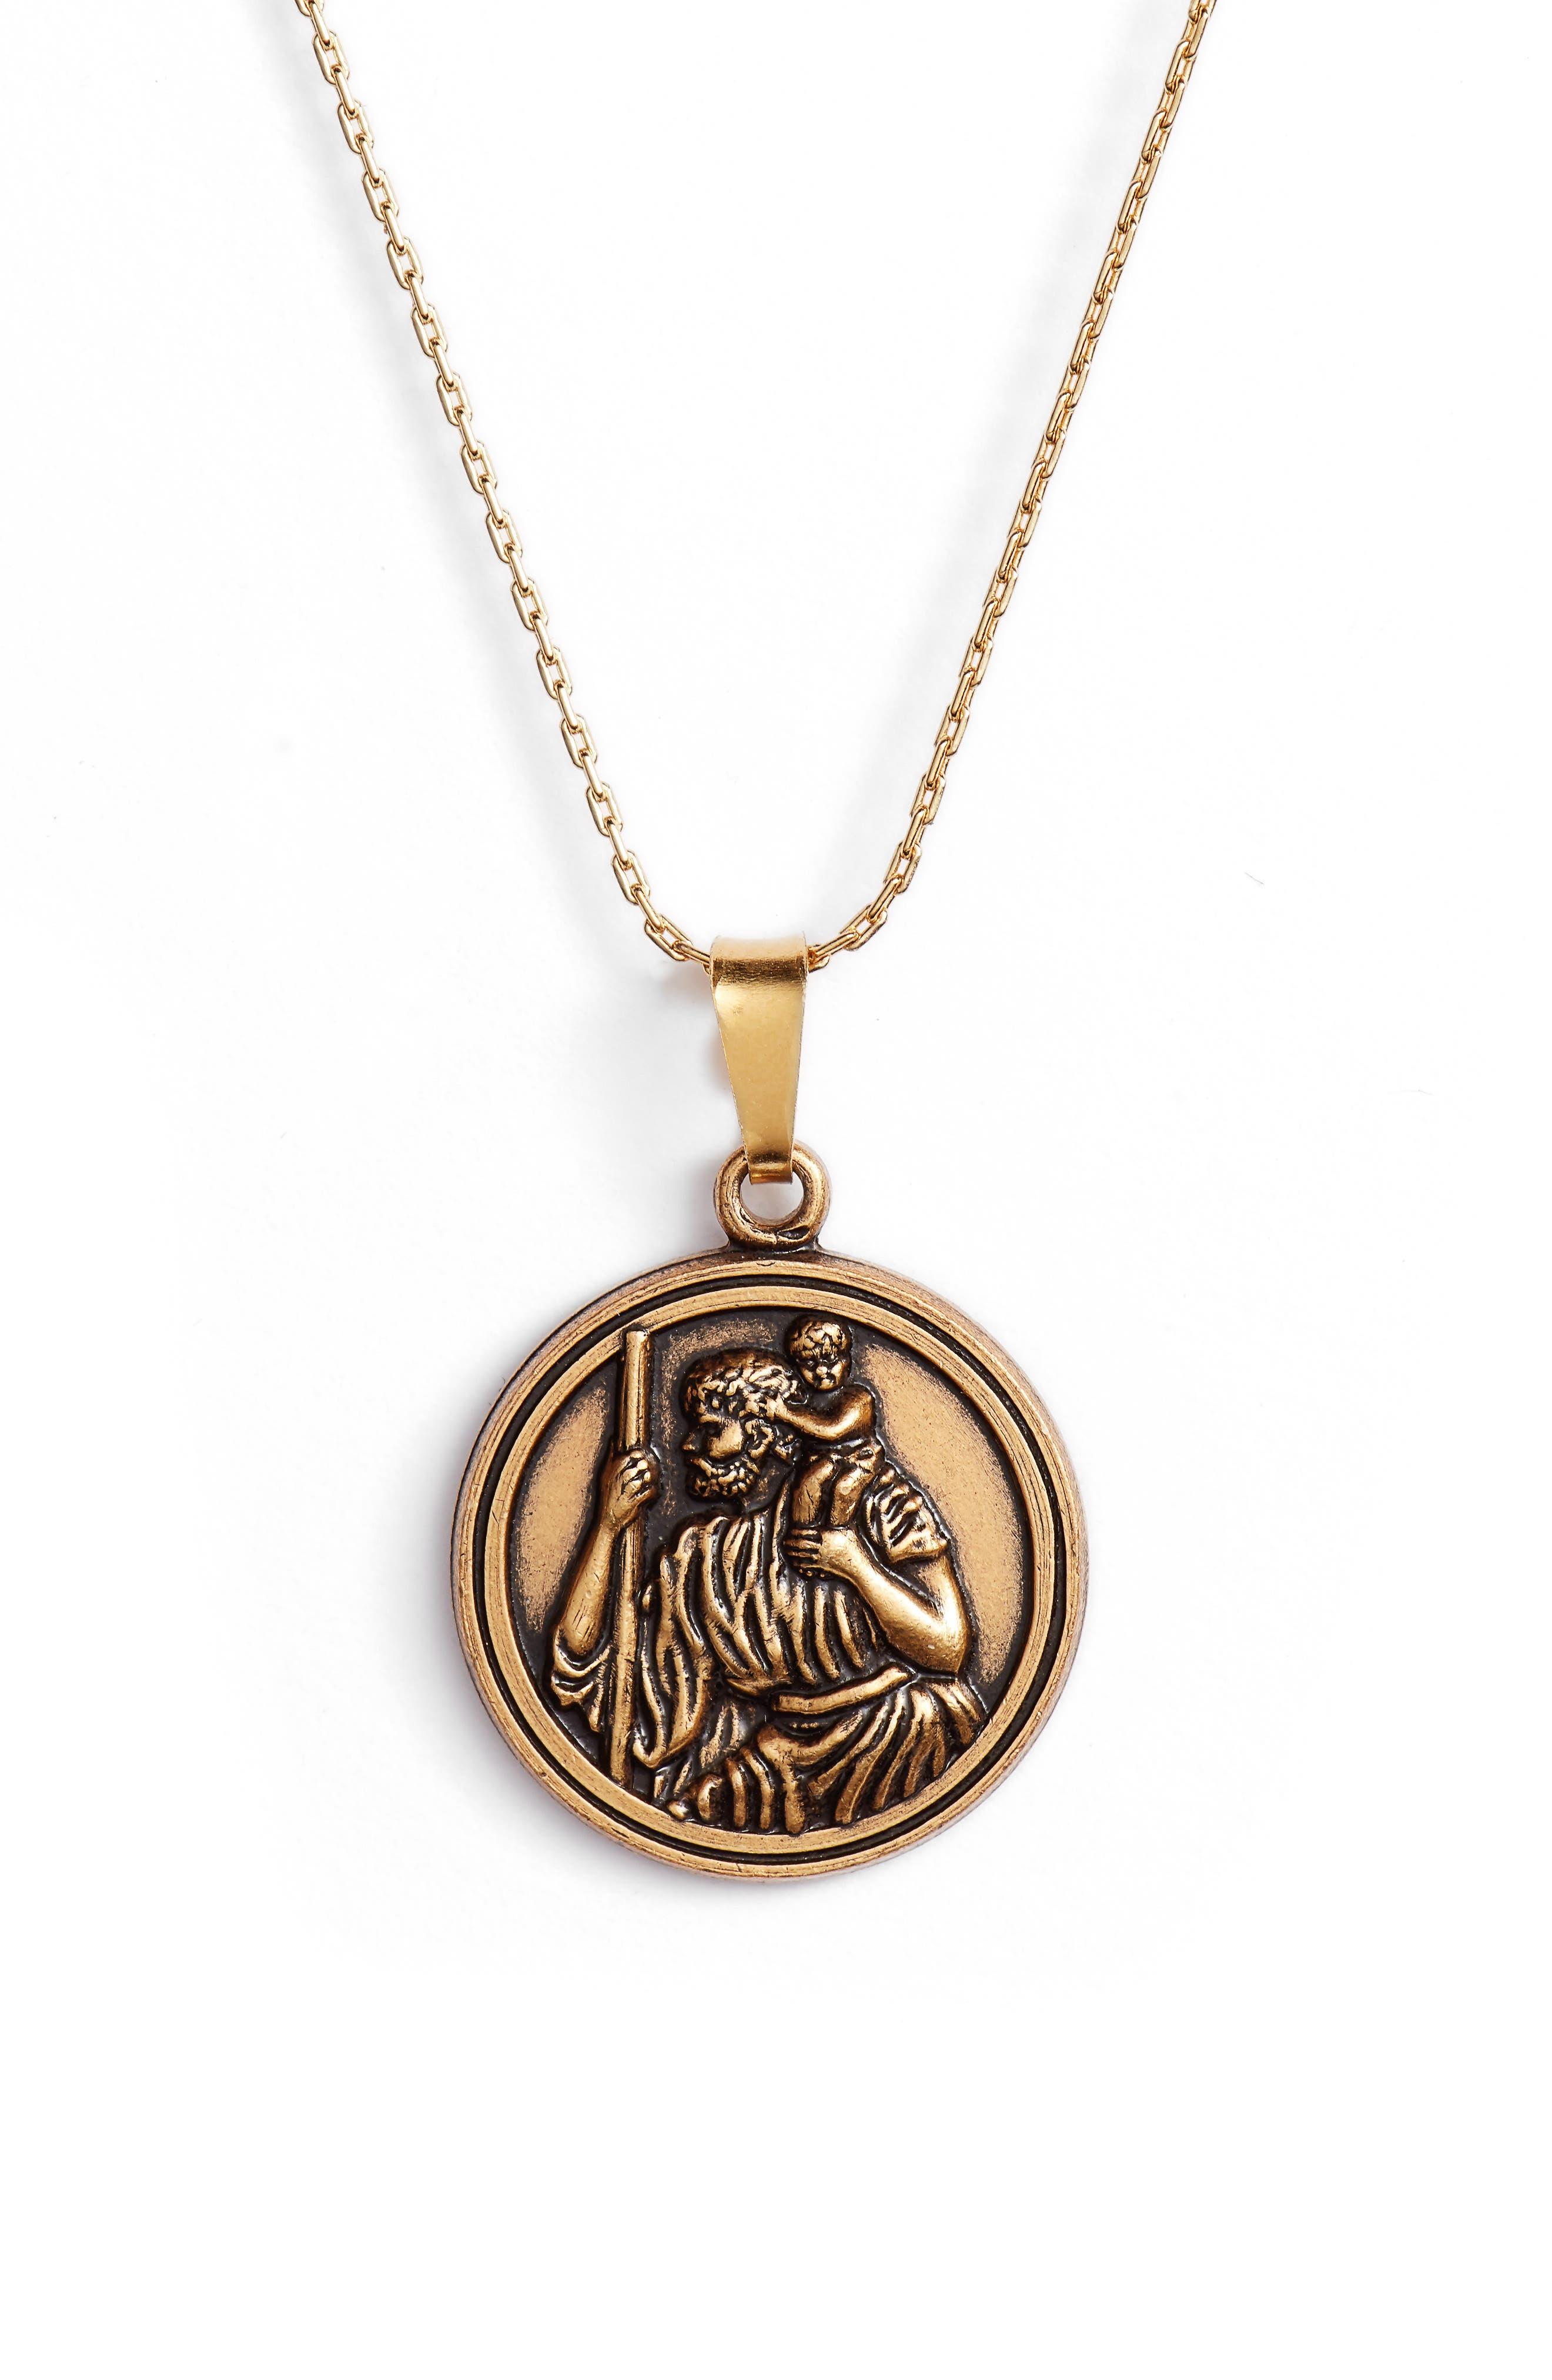 Alex and Ani Saint Christopher Pendant Necklace